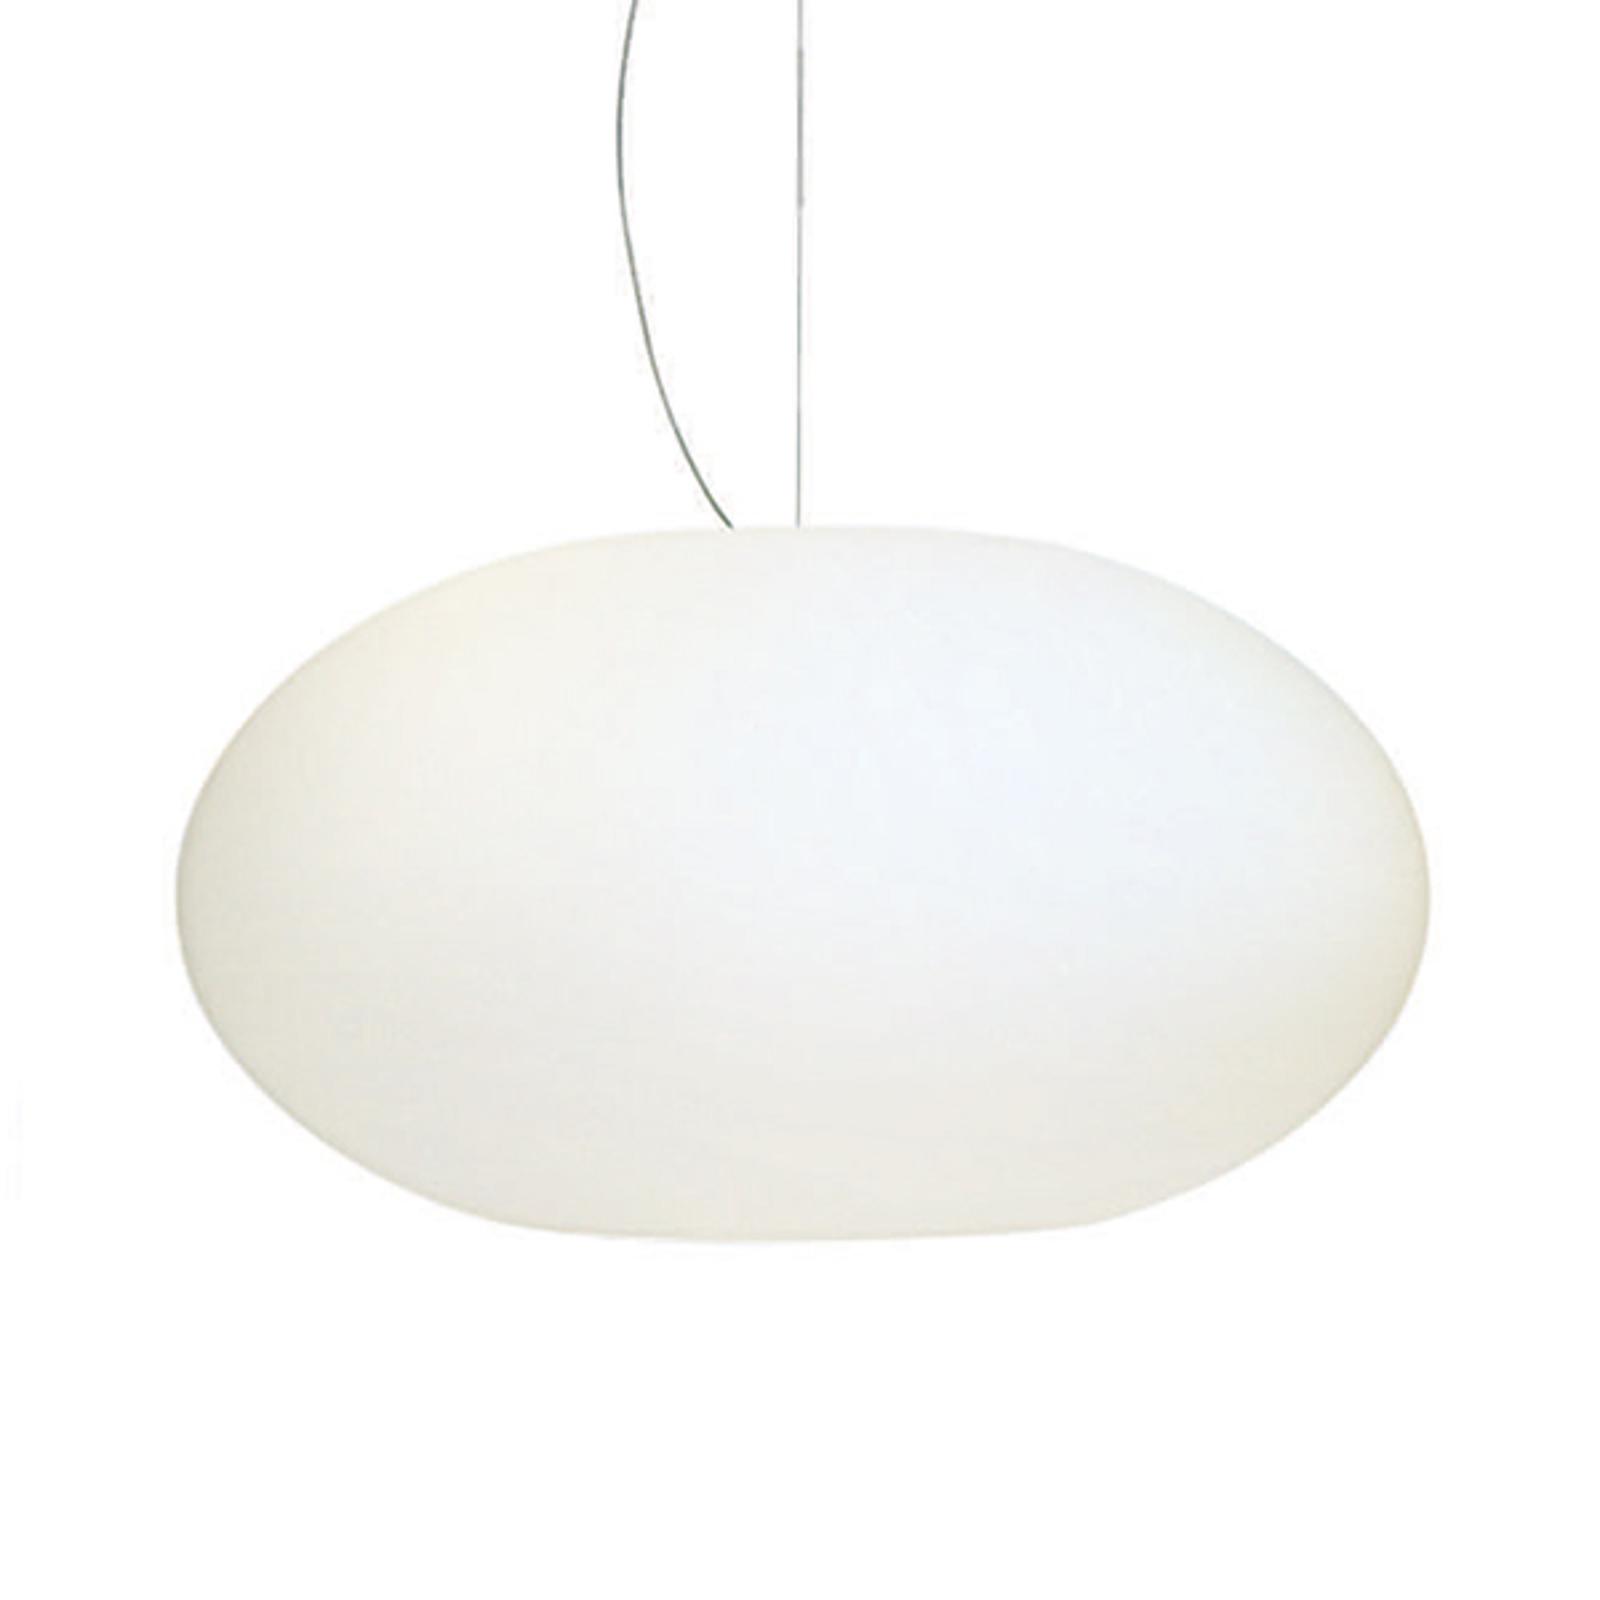 AIH, strakke hanglamp, 28 cm, wit glanzend